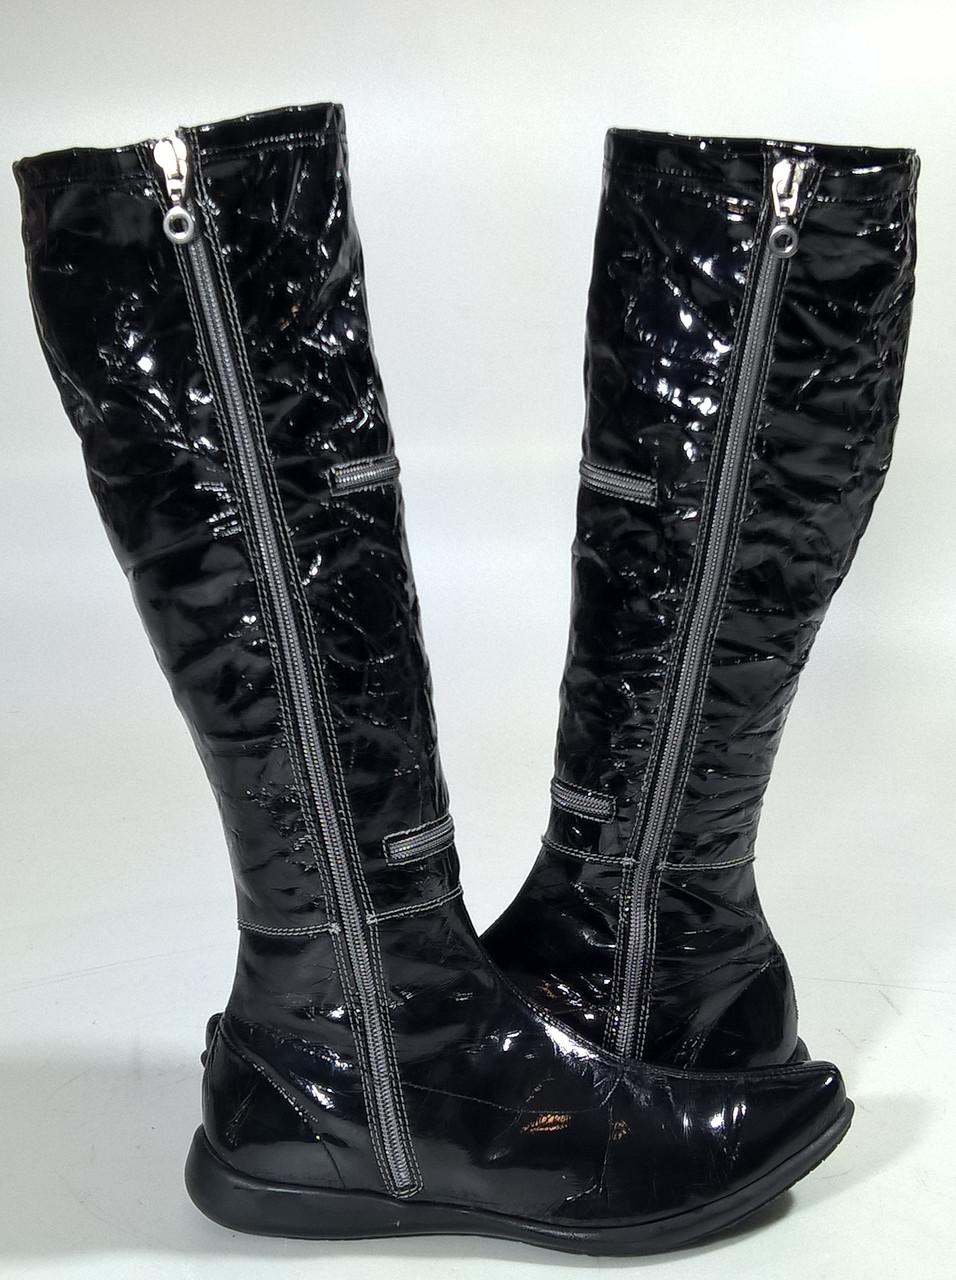 Сапоги- чулки женские 38 размер бренд LILU